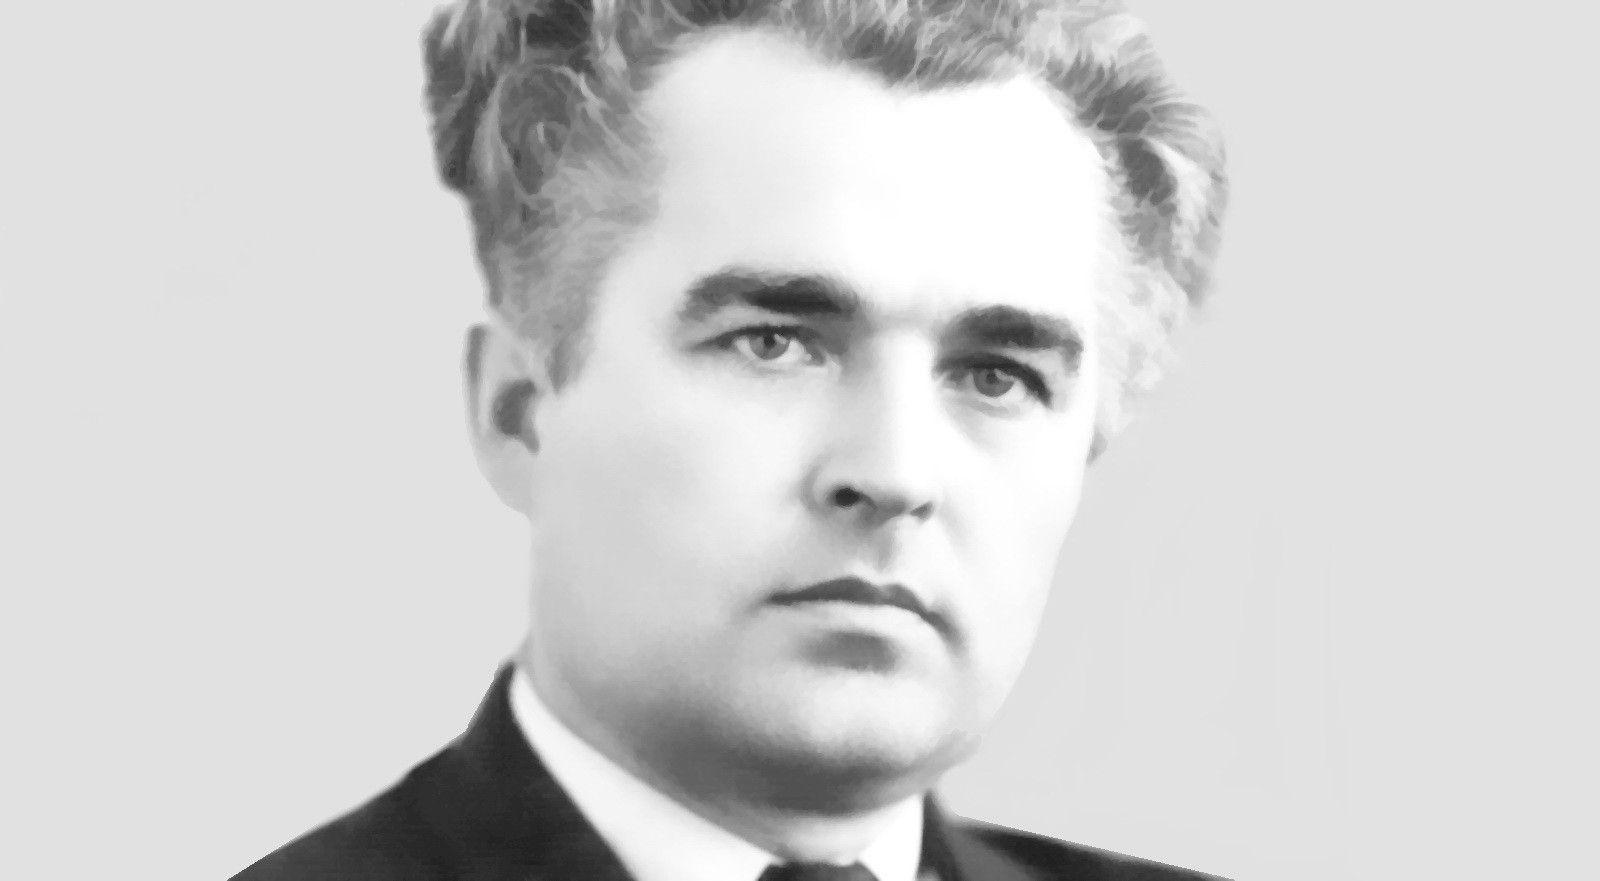 Артур Фридрихович Герман, дядя Анны Герман